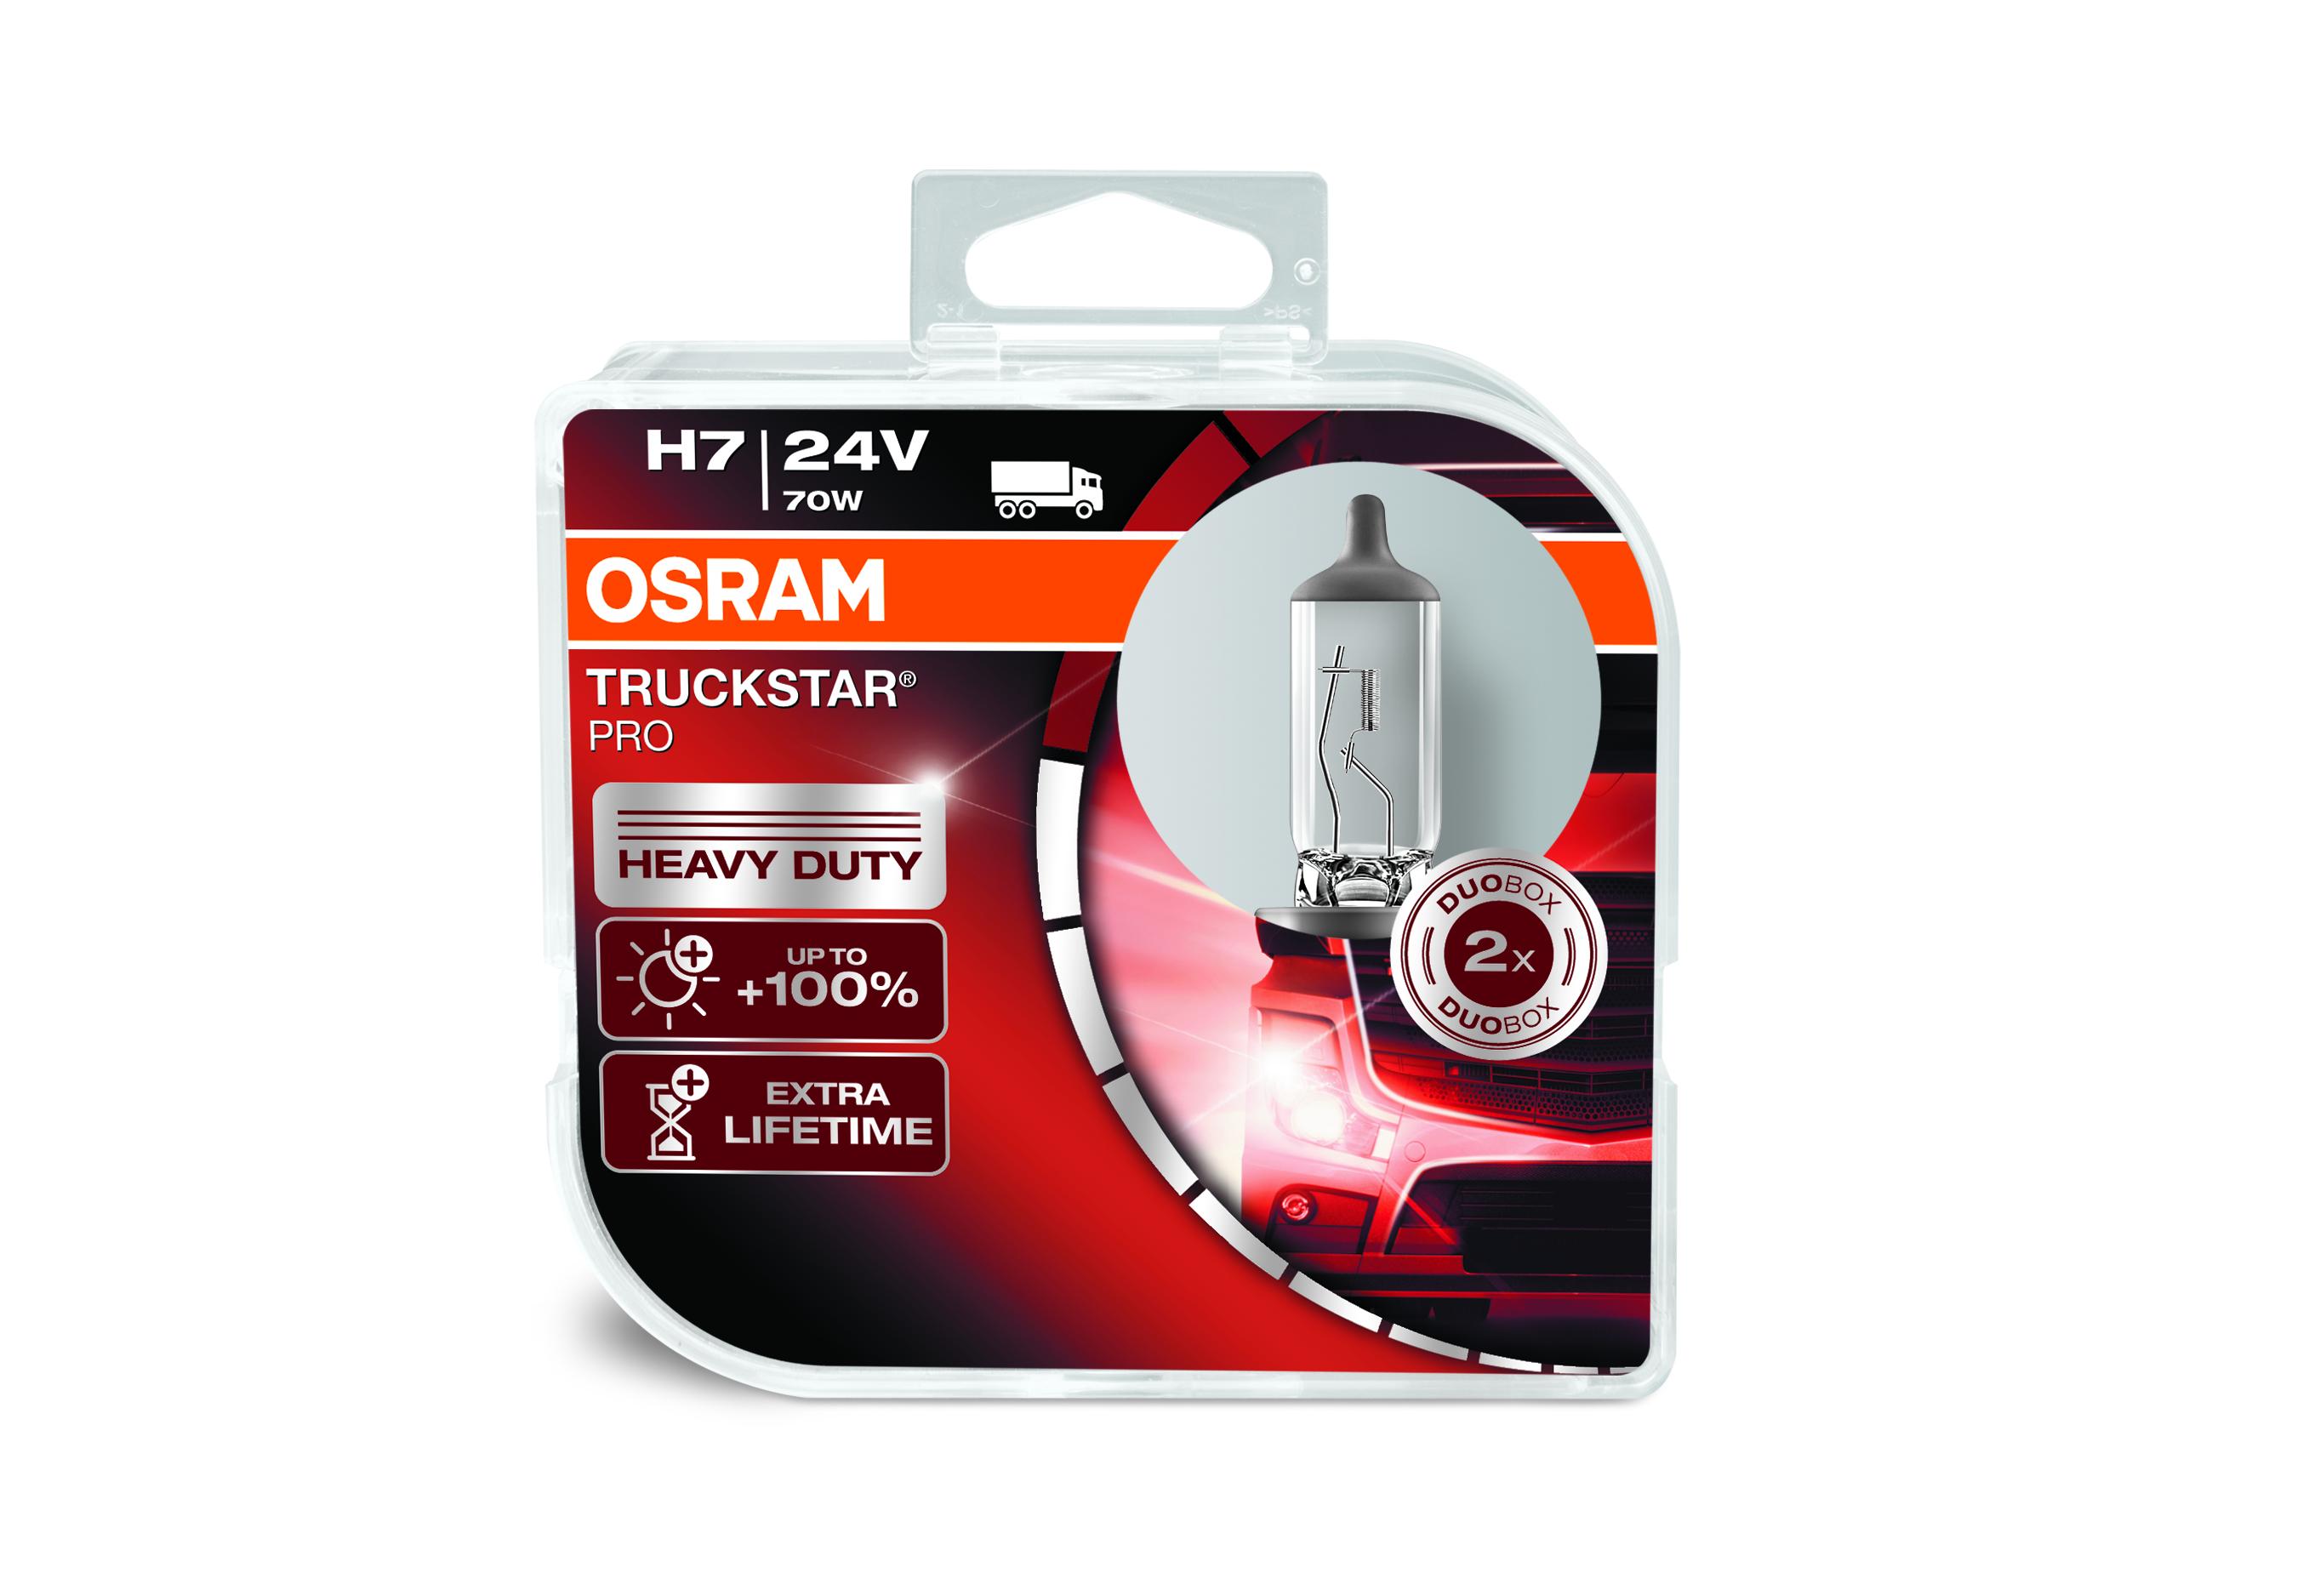 Osram halogenová žárovka, TRUCKSTAR PRO, H7, Px26d, 24V, 70W, 64215TSP-HCB